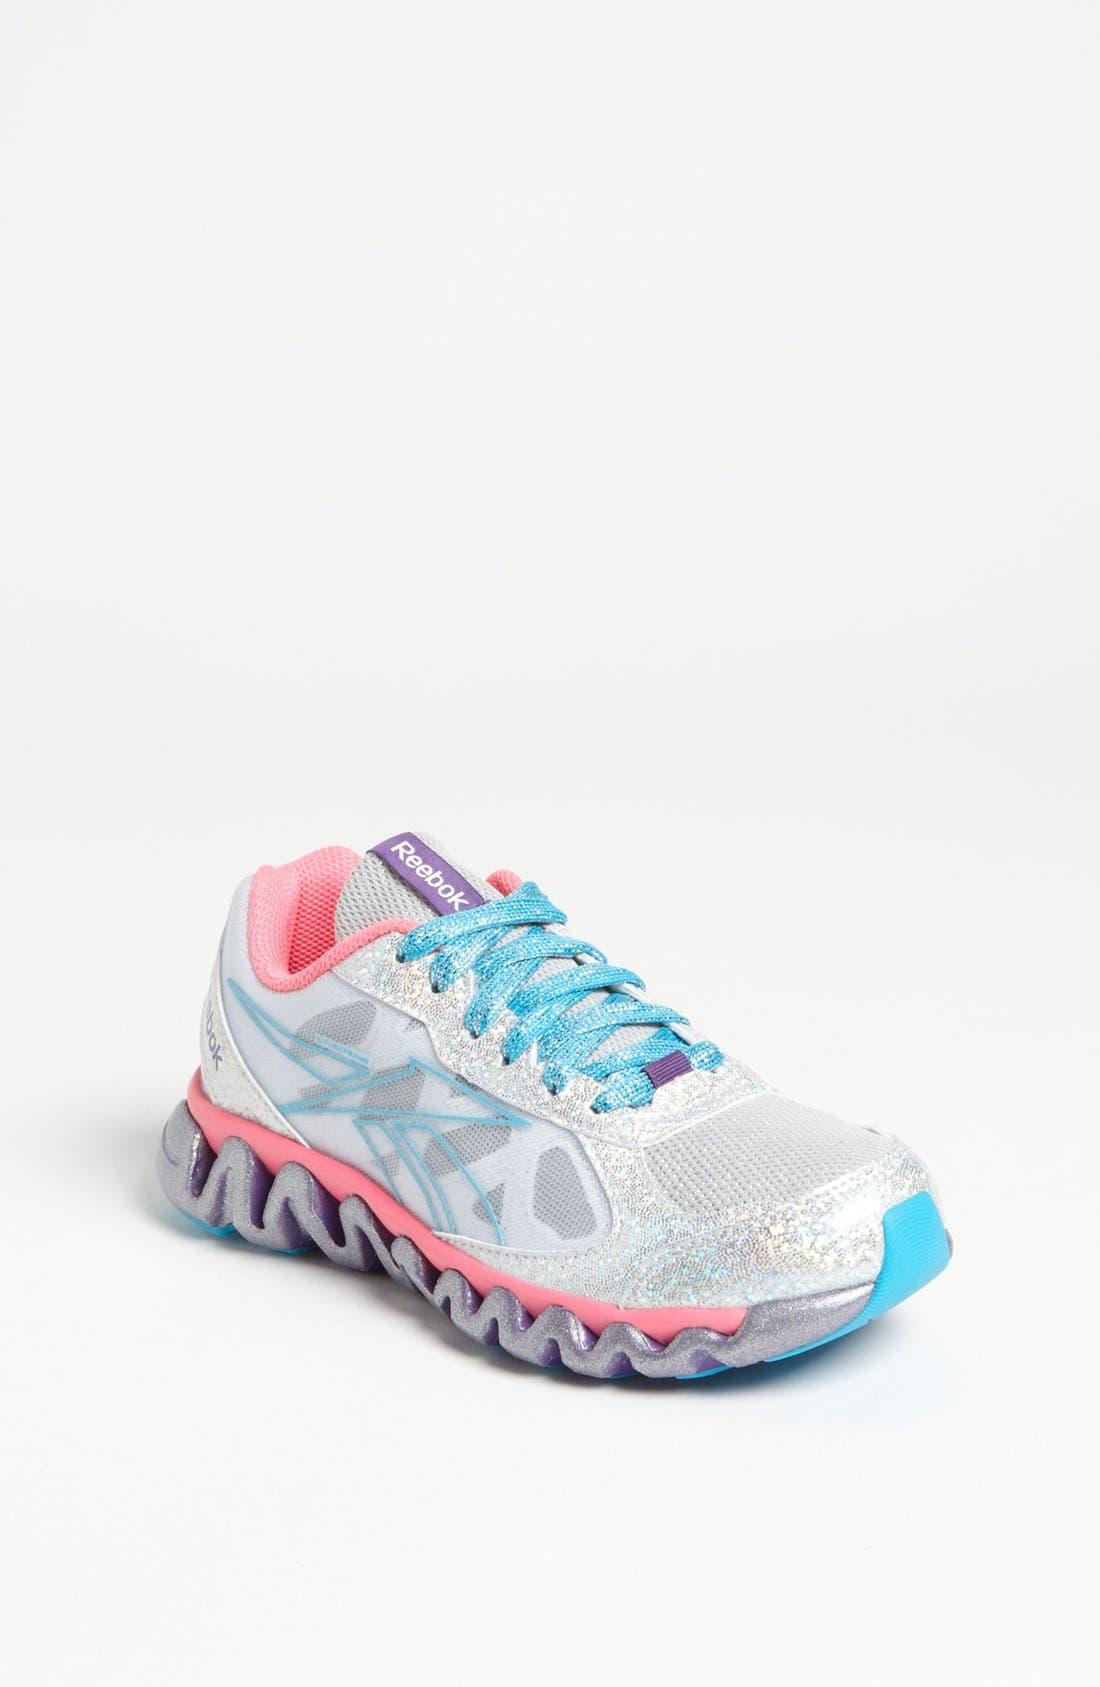 Main Image - Reebok 'ZigLite Rush' Sneaker (Toddler & Little Kid)